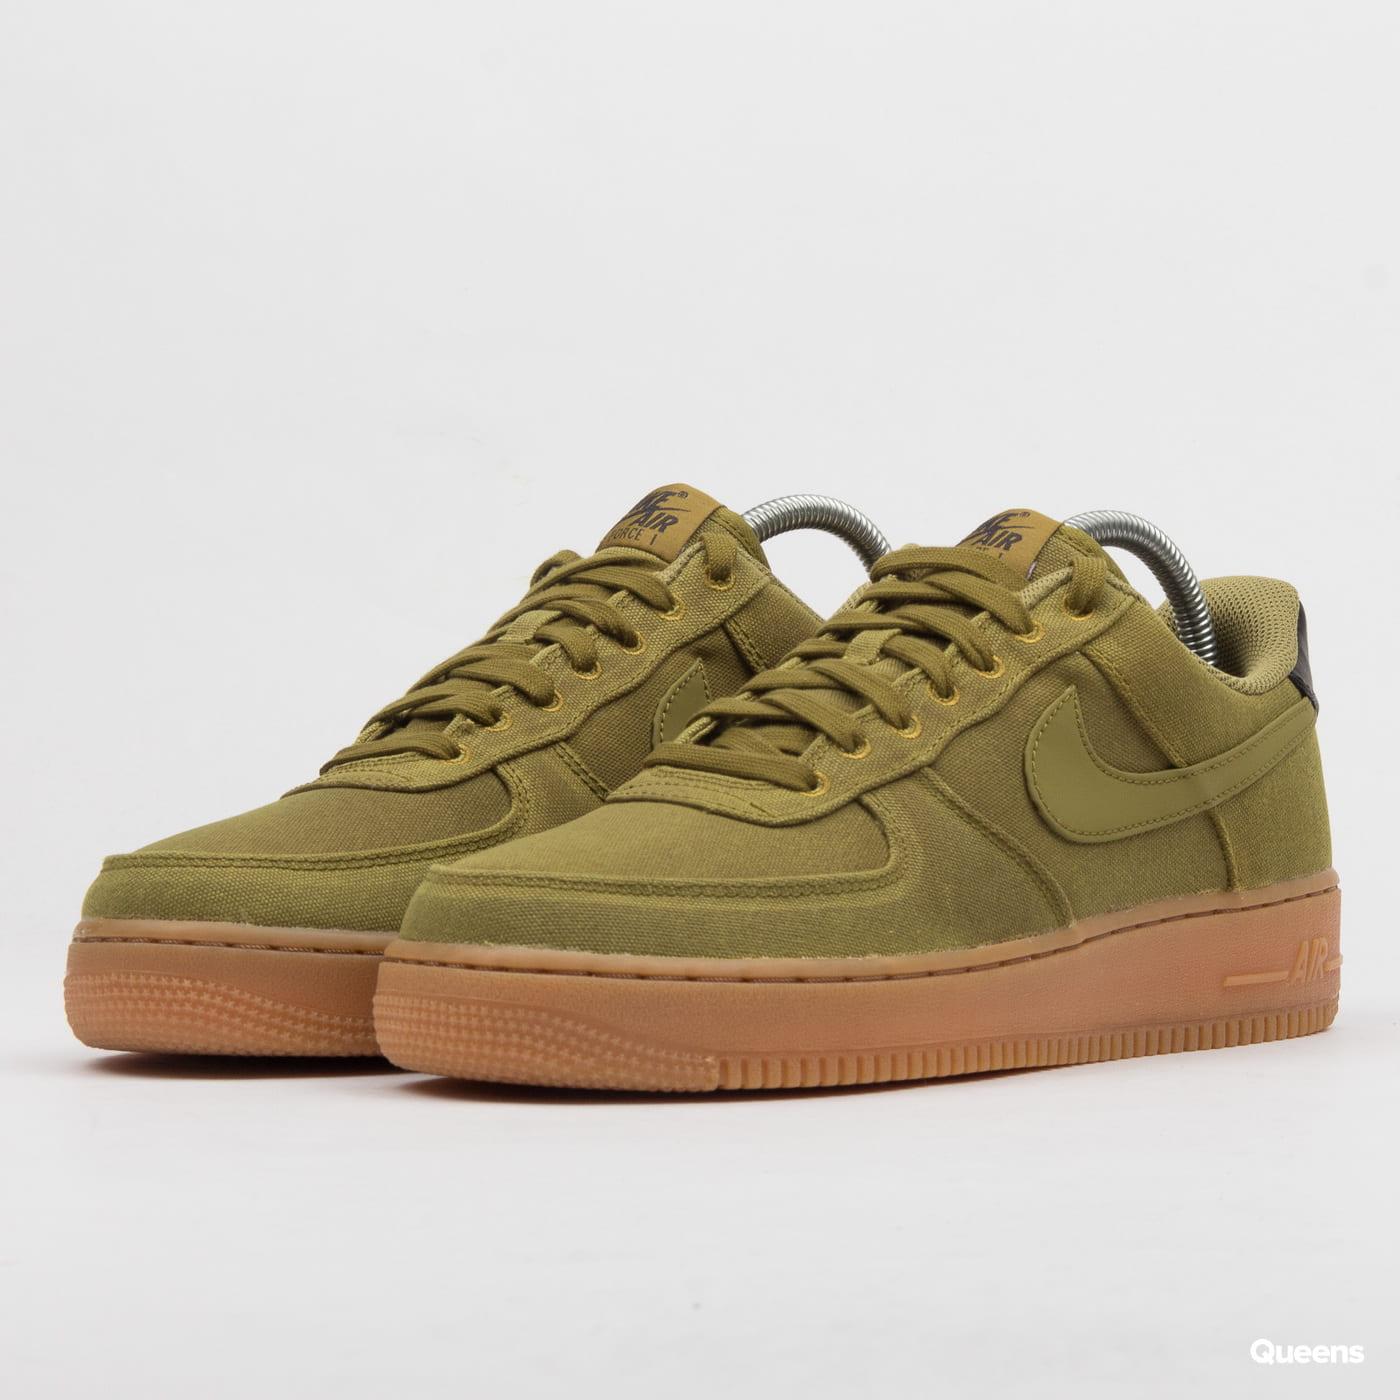 meet 274cf a09aa Sneakers Nike Air Force 1  07 LV8 Style (AQ0117-300)– Queens 💚